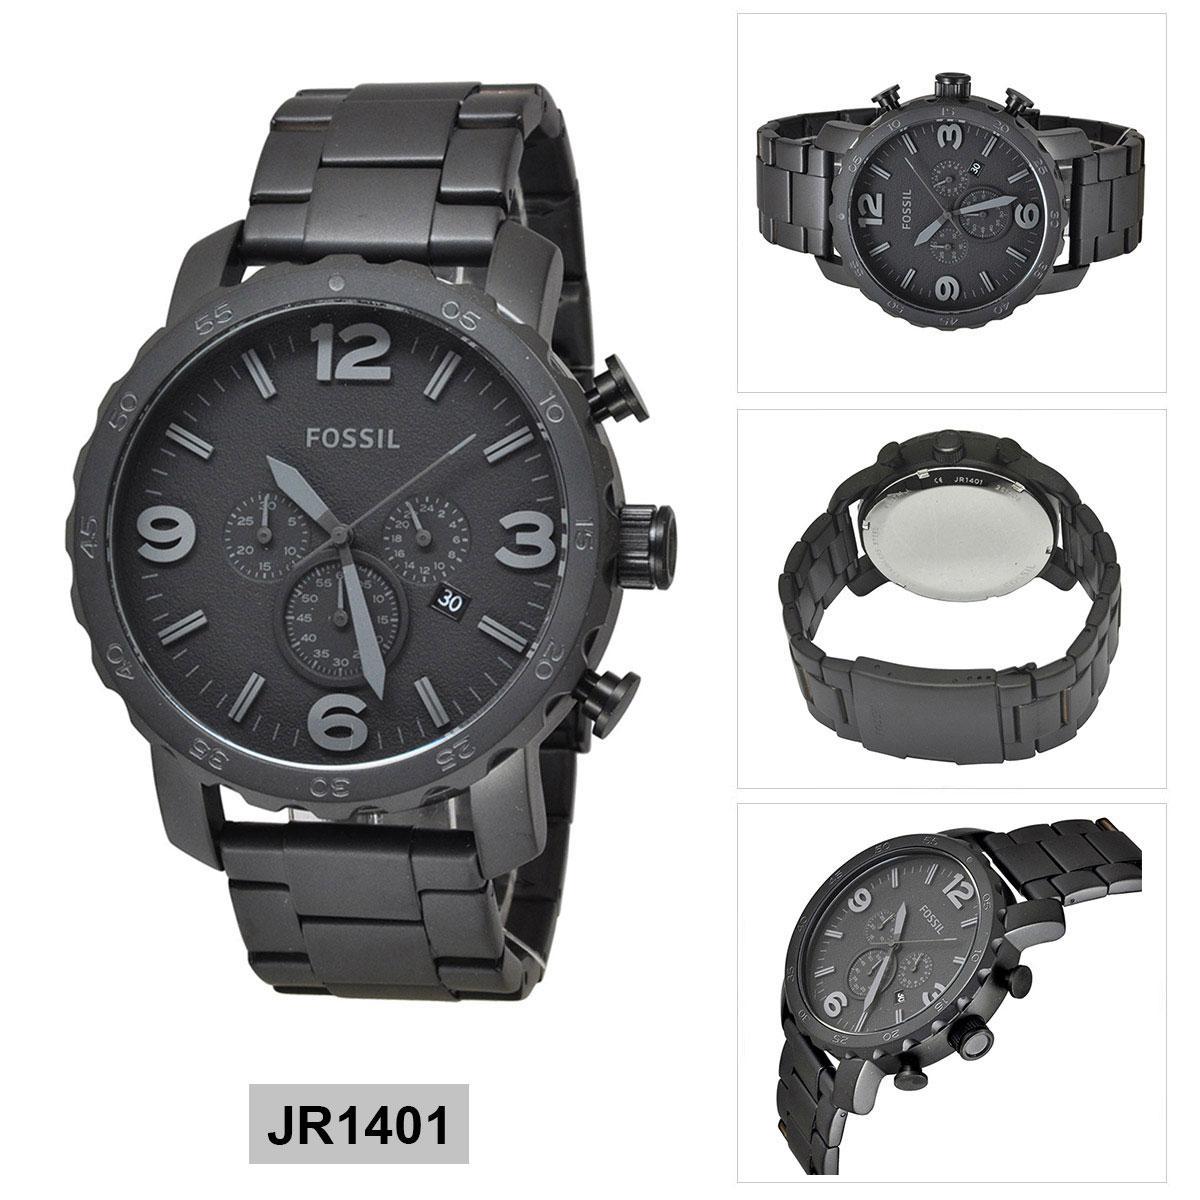 Fossil Nate Chronograph Black Stainless Steel Case Jr1401 Watch Bracelet Mens Lazada Ph